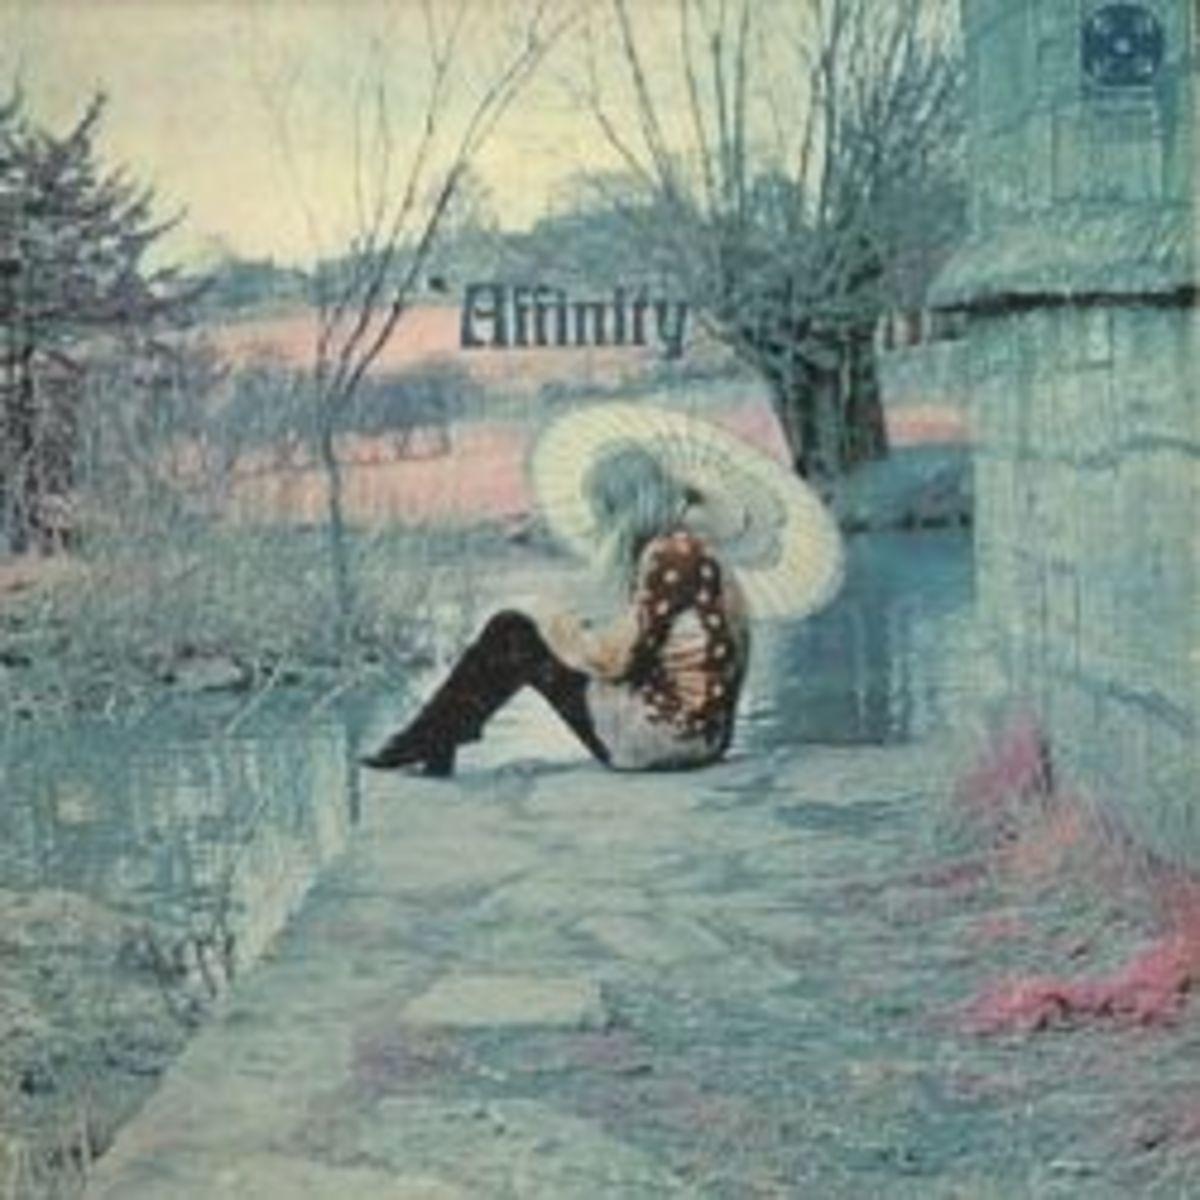 "Affinity ""Affinity"" Paramount Records PAS-5027 12"" LP Vinyl Record (1970) US Pressing"